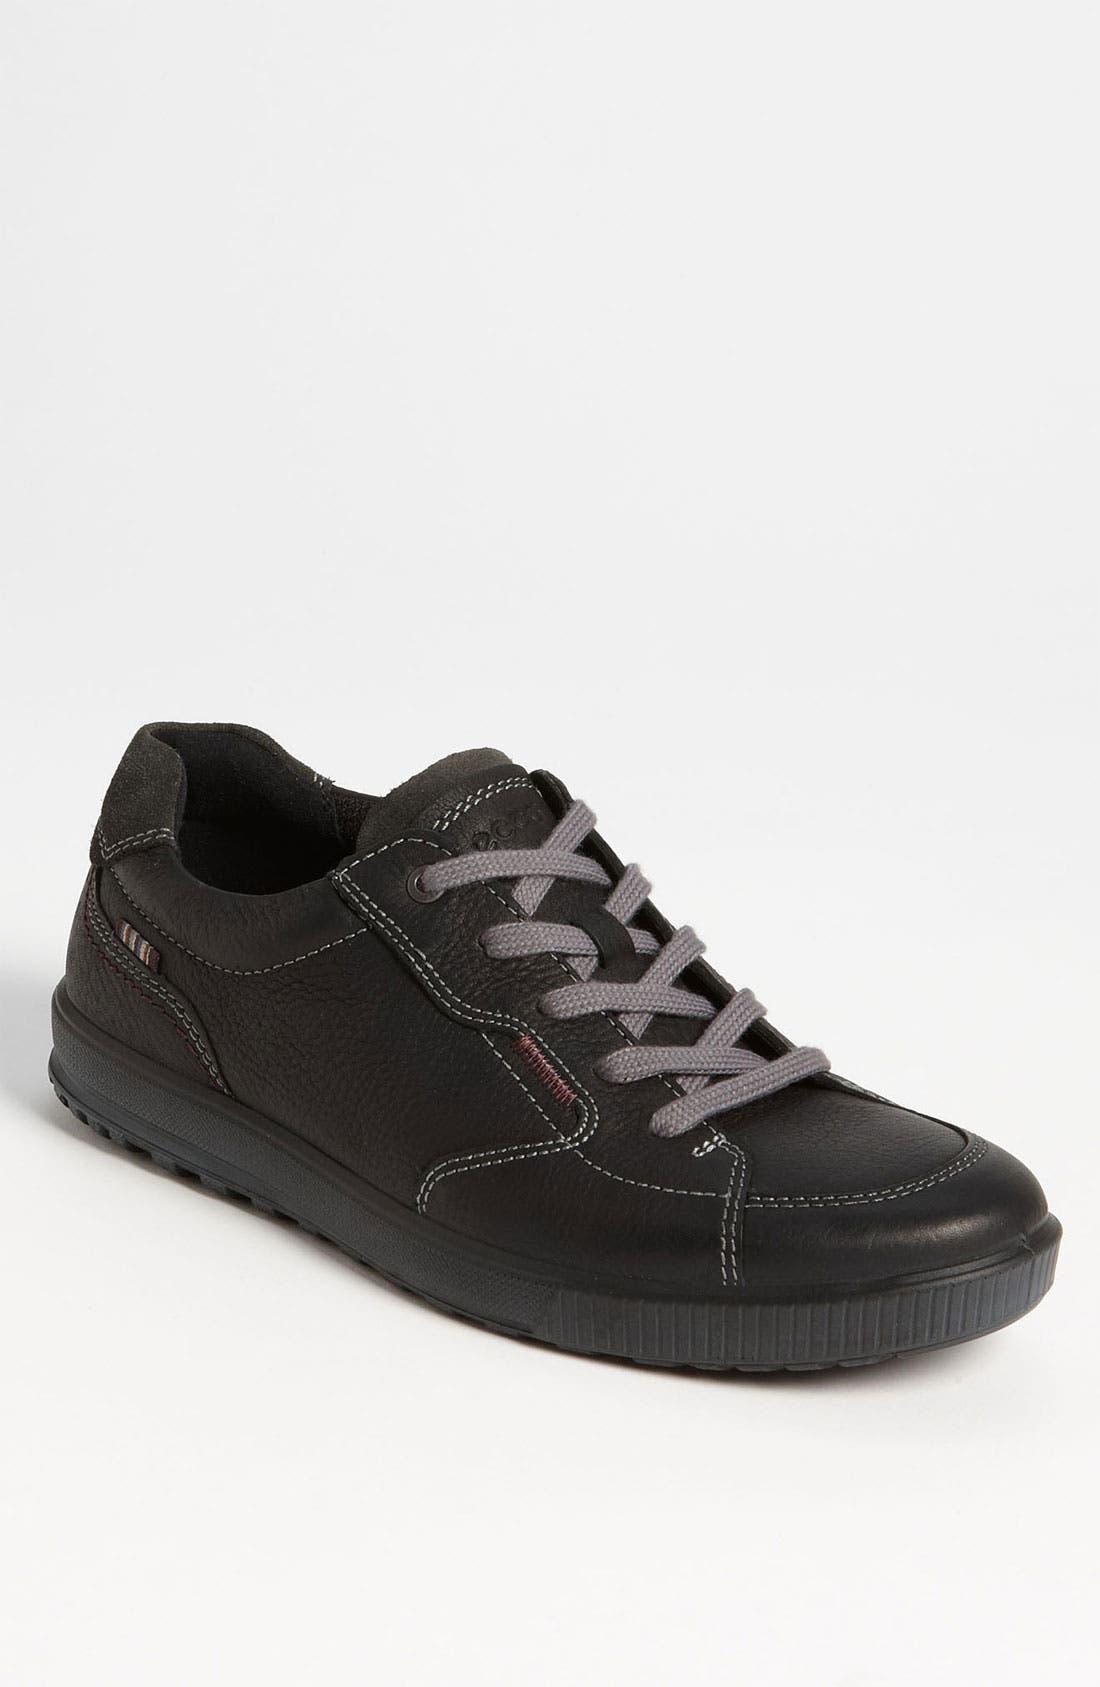 Alternate Image 1 Selected - ECCO 'Bradley' Sneaker